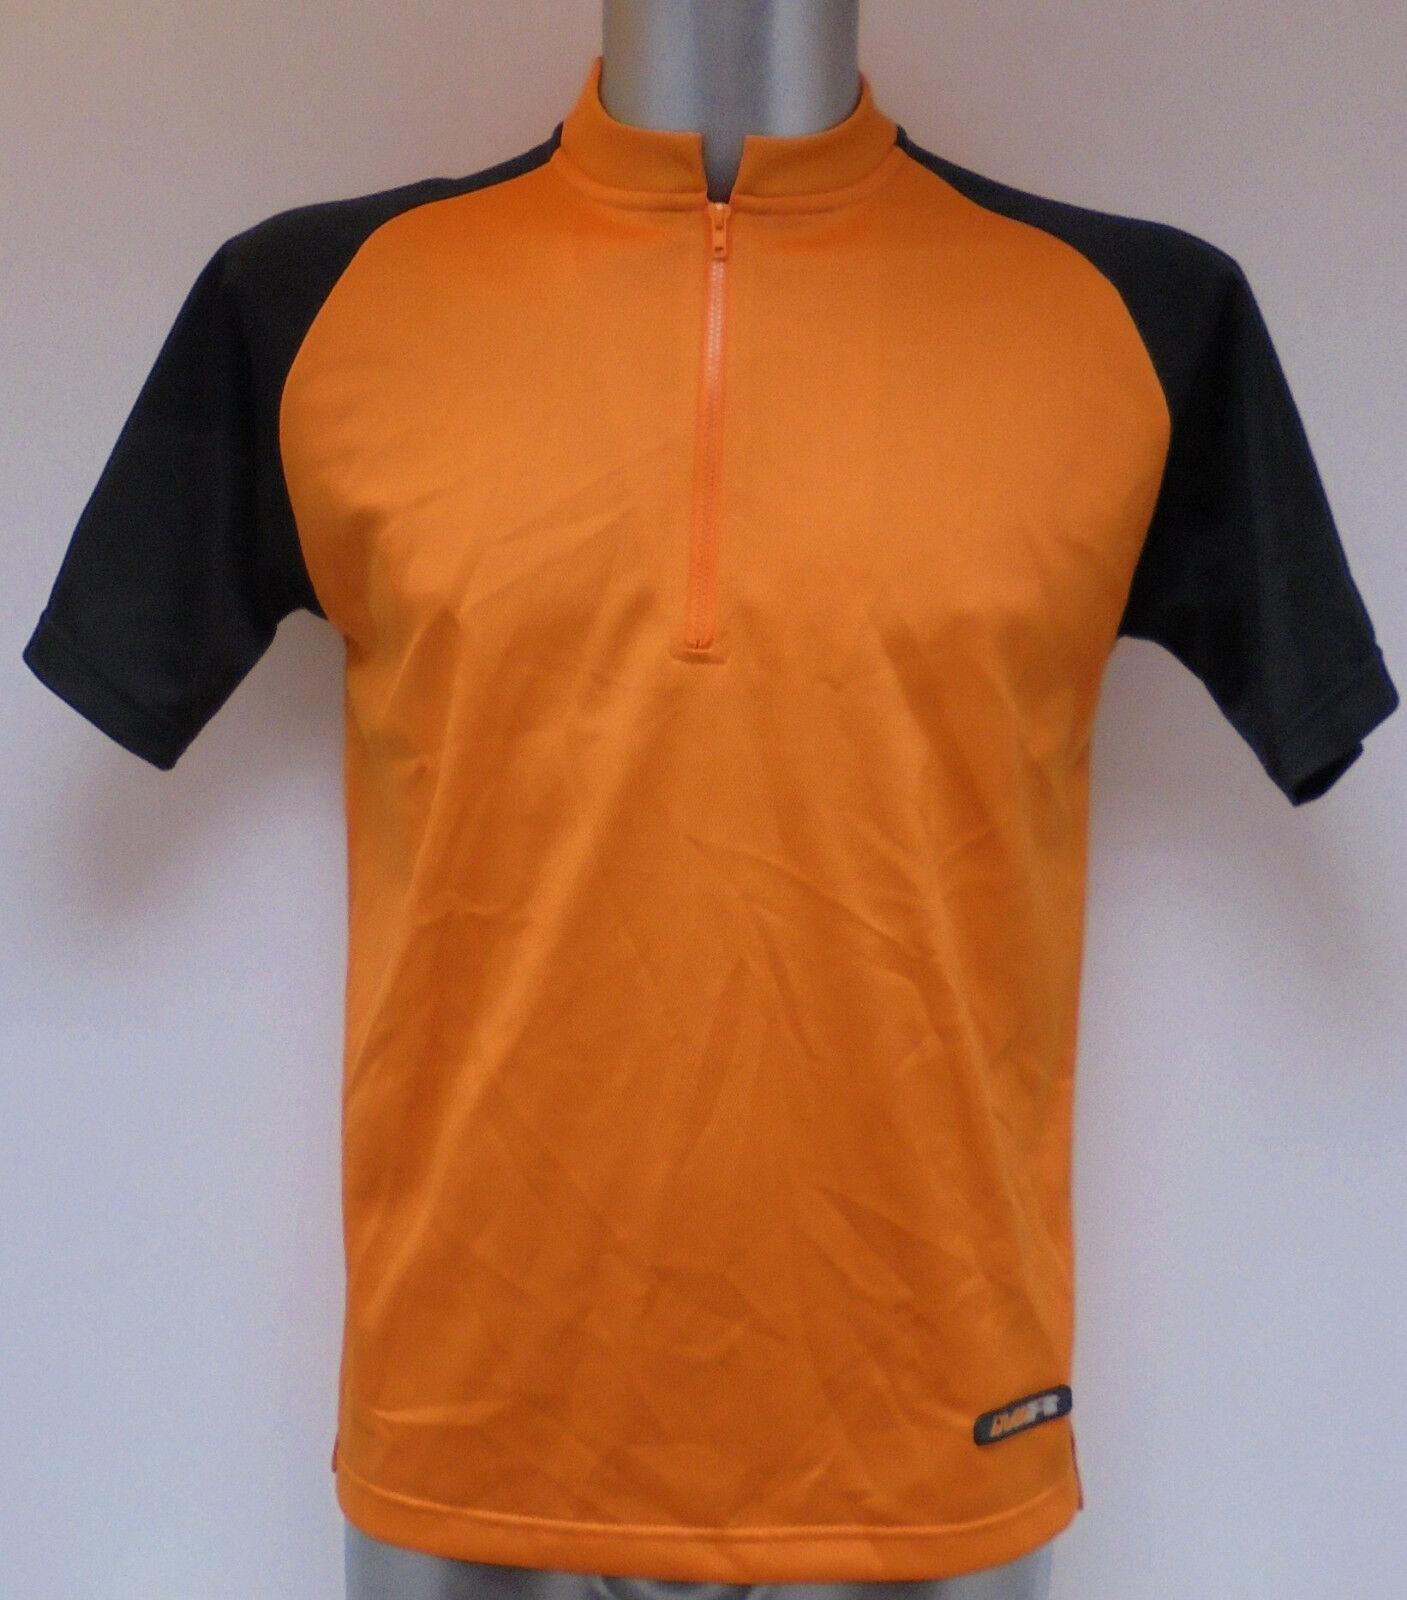 "Mountain Ridge Cycle Cycling Shirt Jersey Large 42"" Fahrradtrikot"